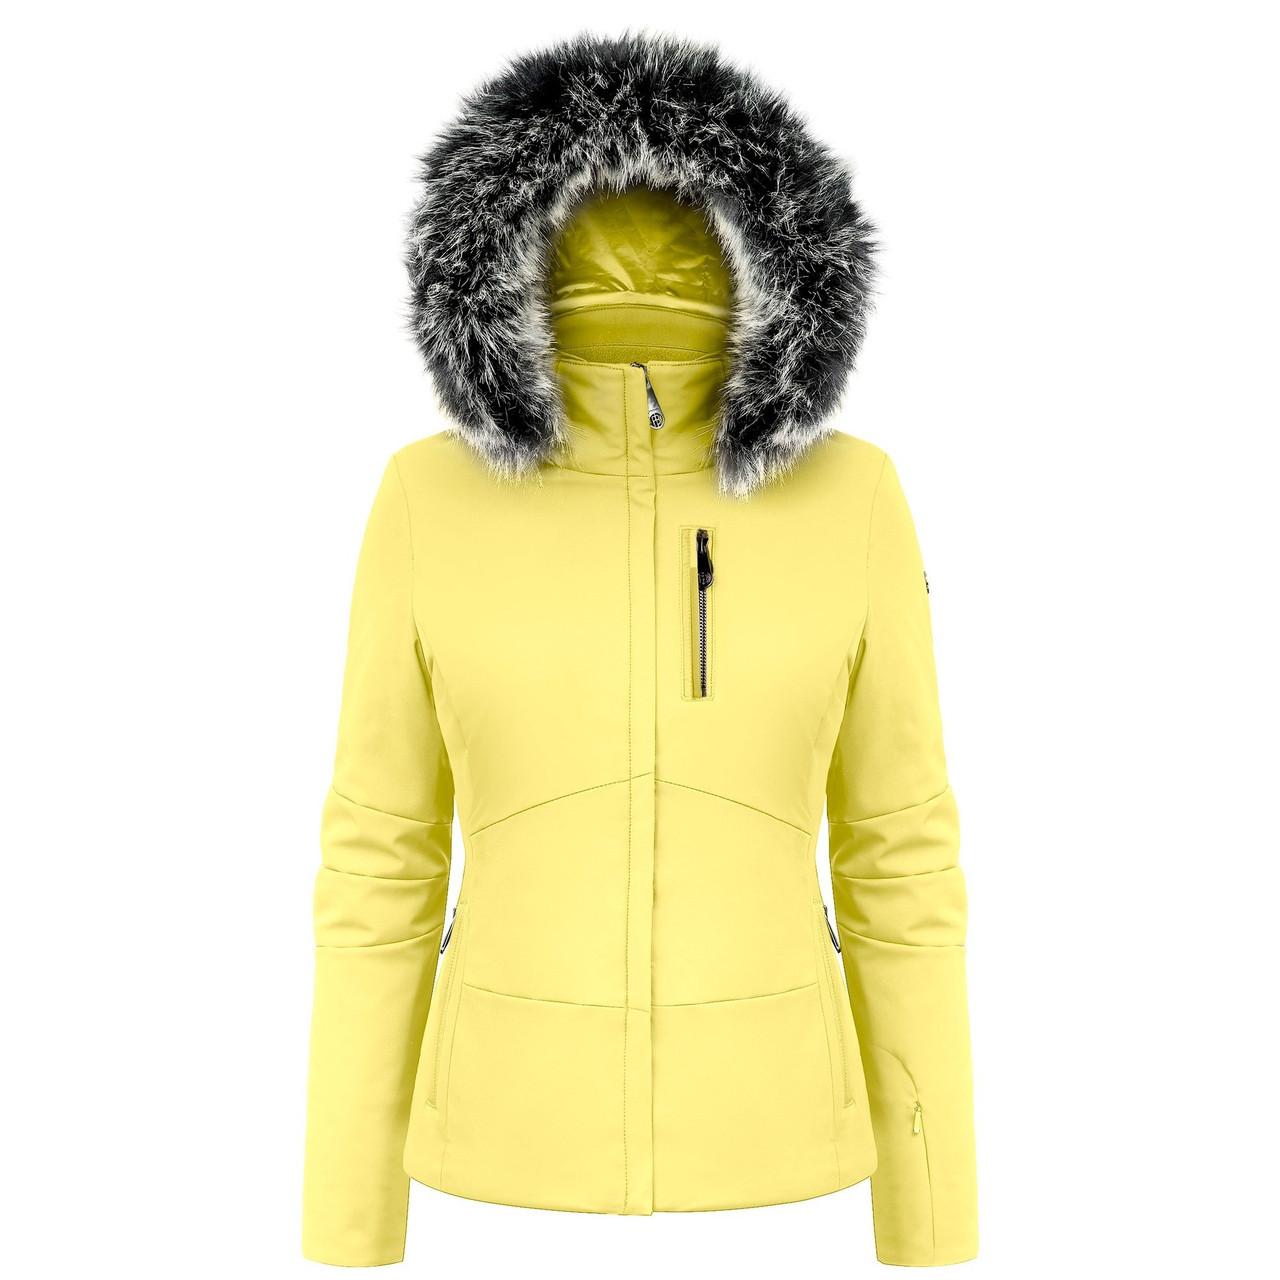 Горнолыжная куртка Poivre Blanc Stretch ski jaket Aurora Yellow р L